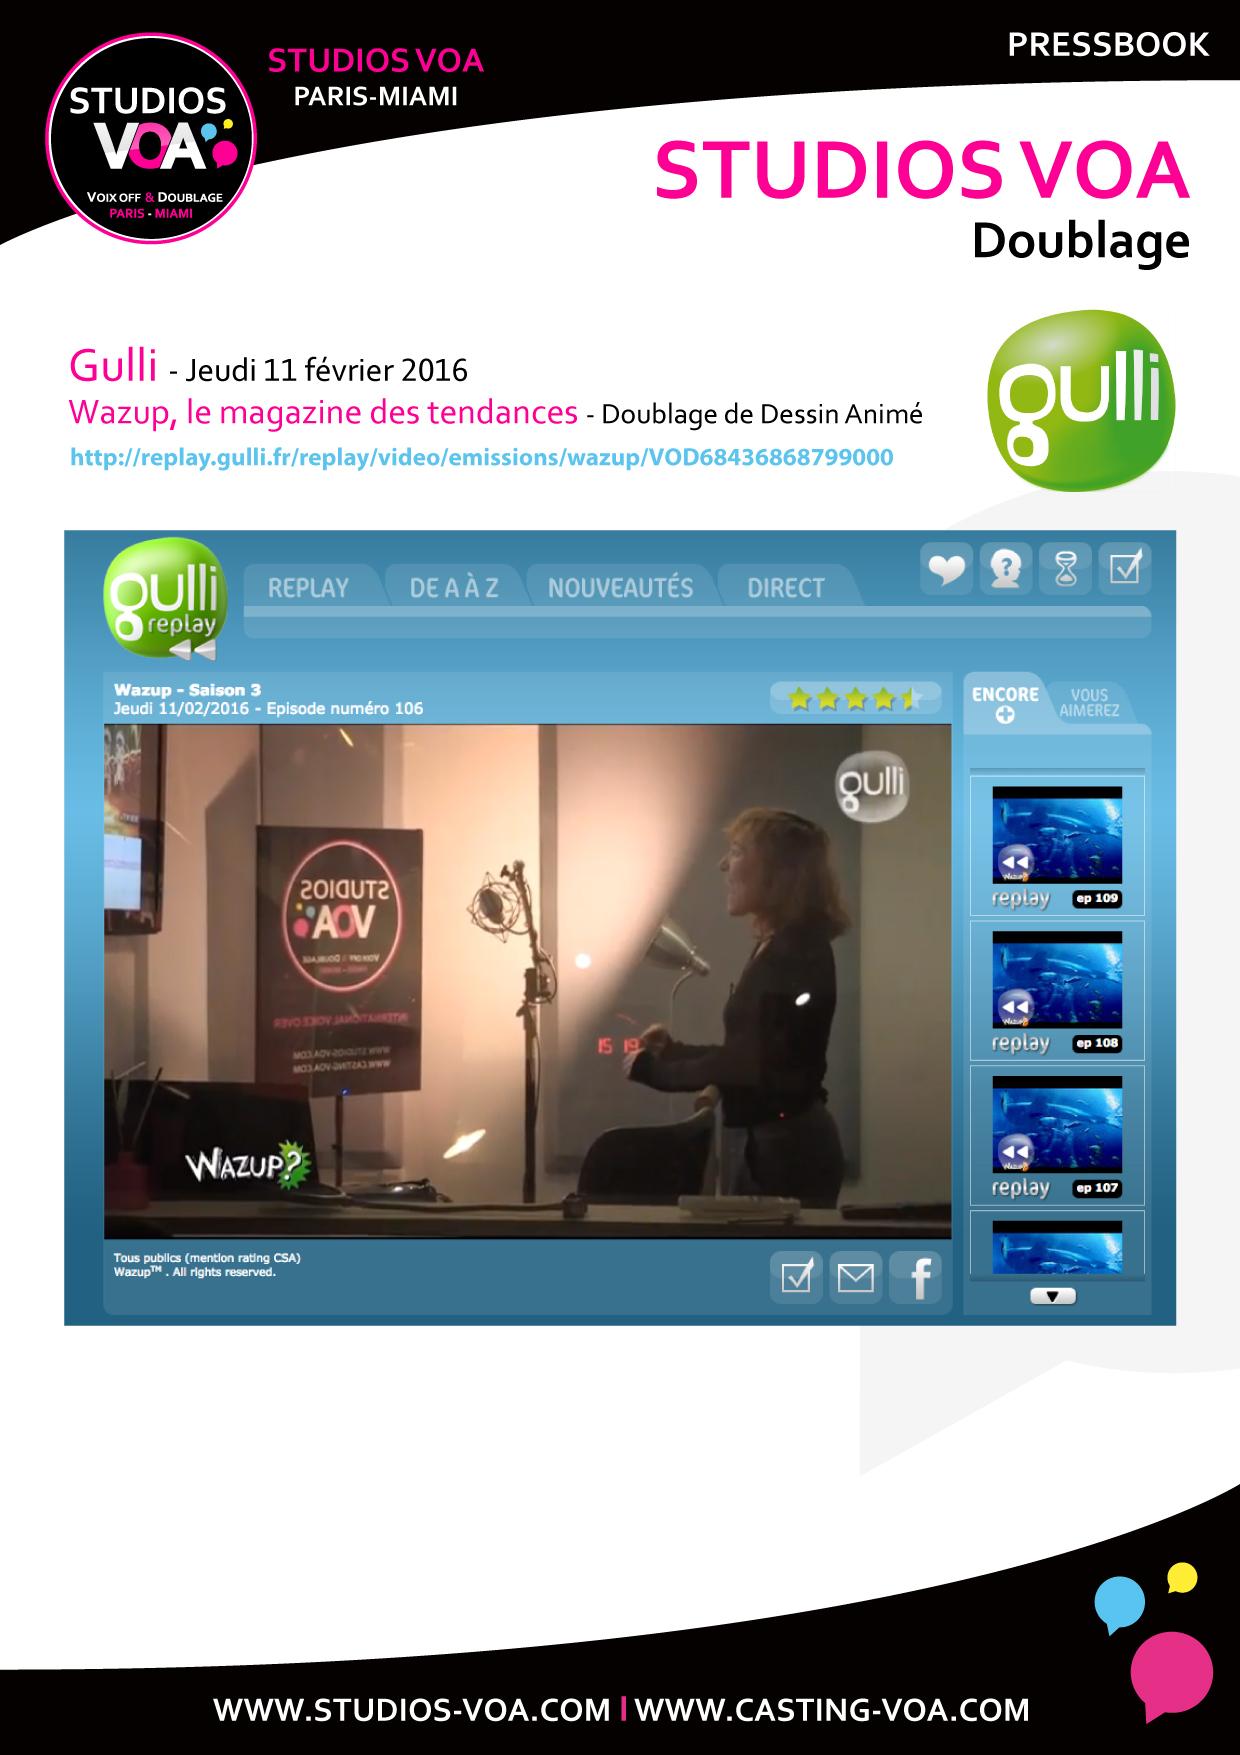 Pressbook-VOA_160122_Plan-de-travail-011-Gulli